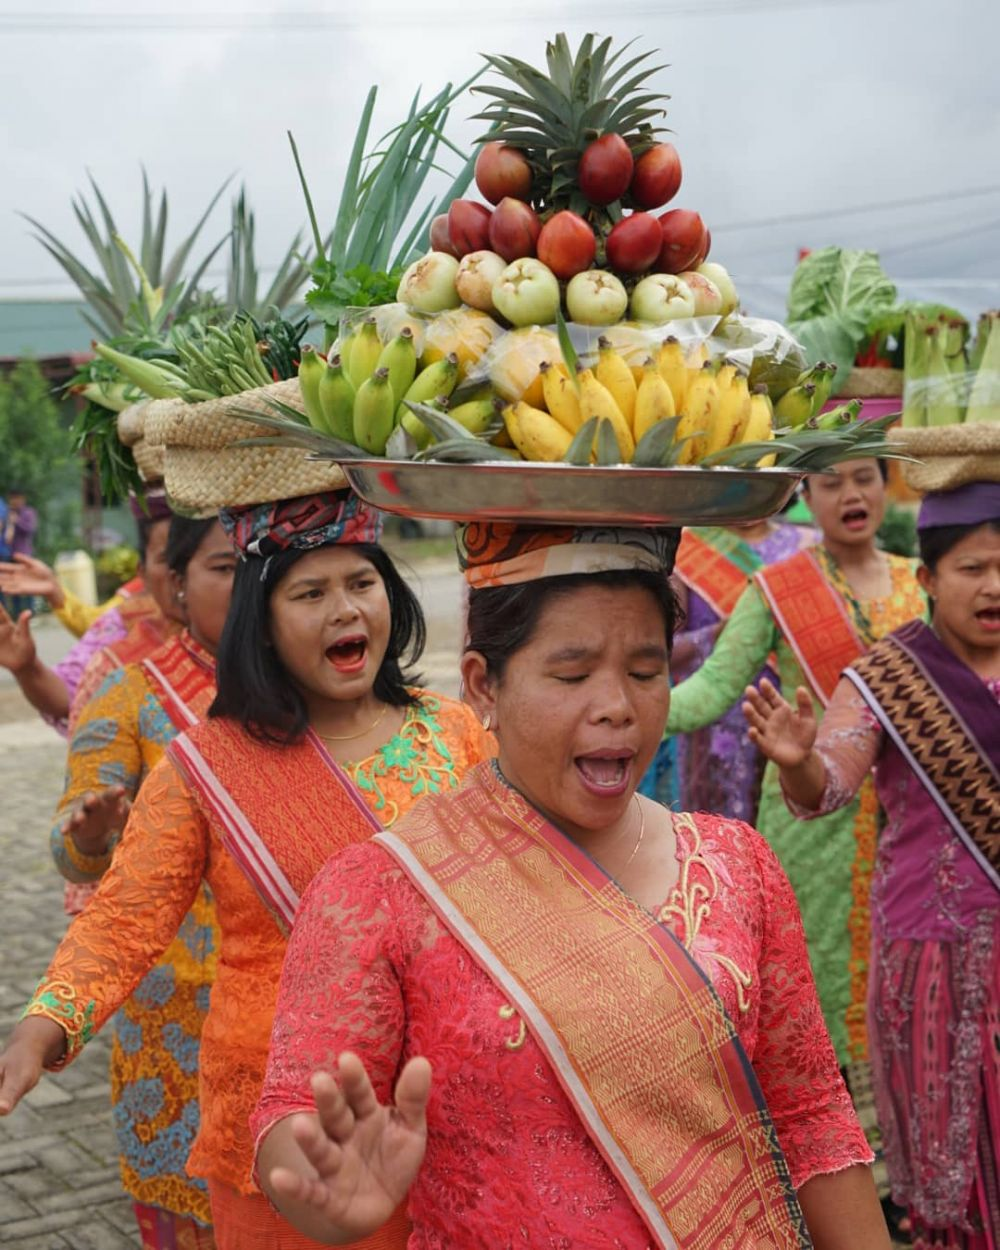 5 Tips Menjalani Hidup dari 'Umpasa' Pantun Suku Batak